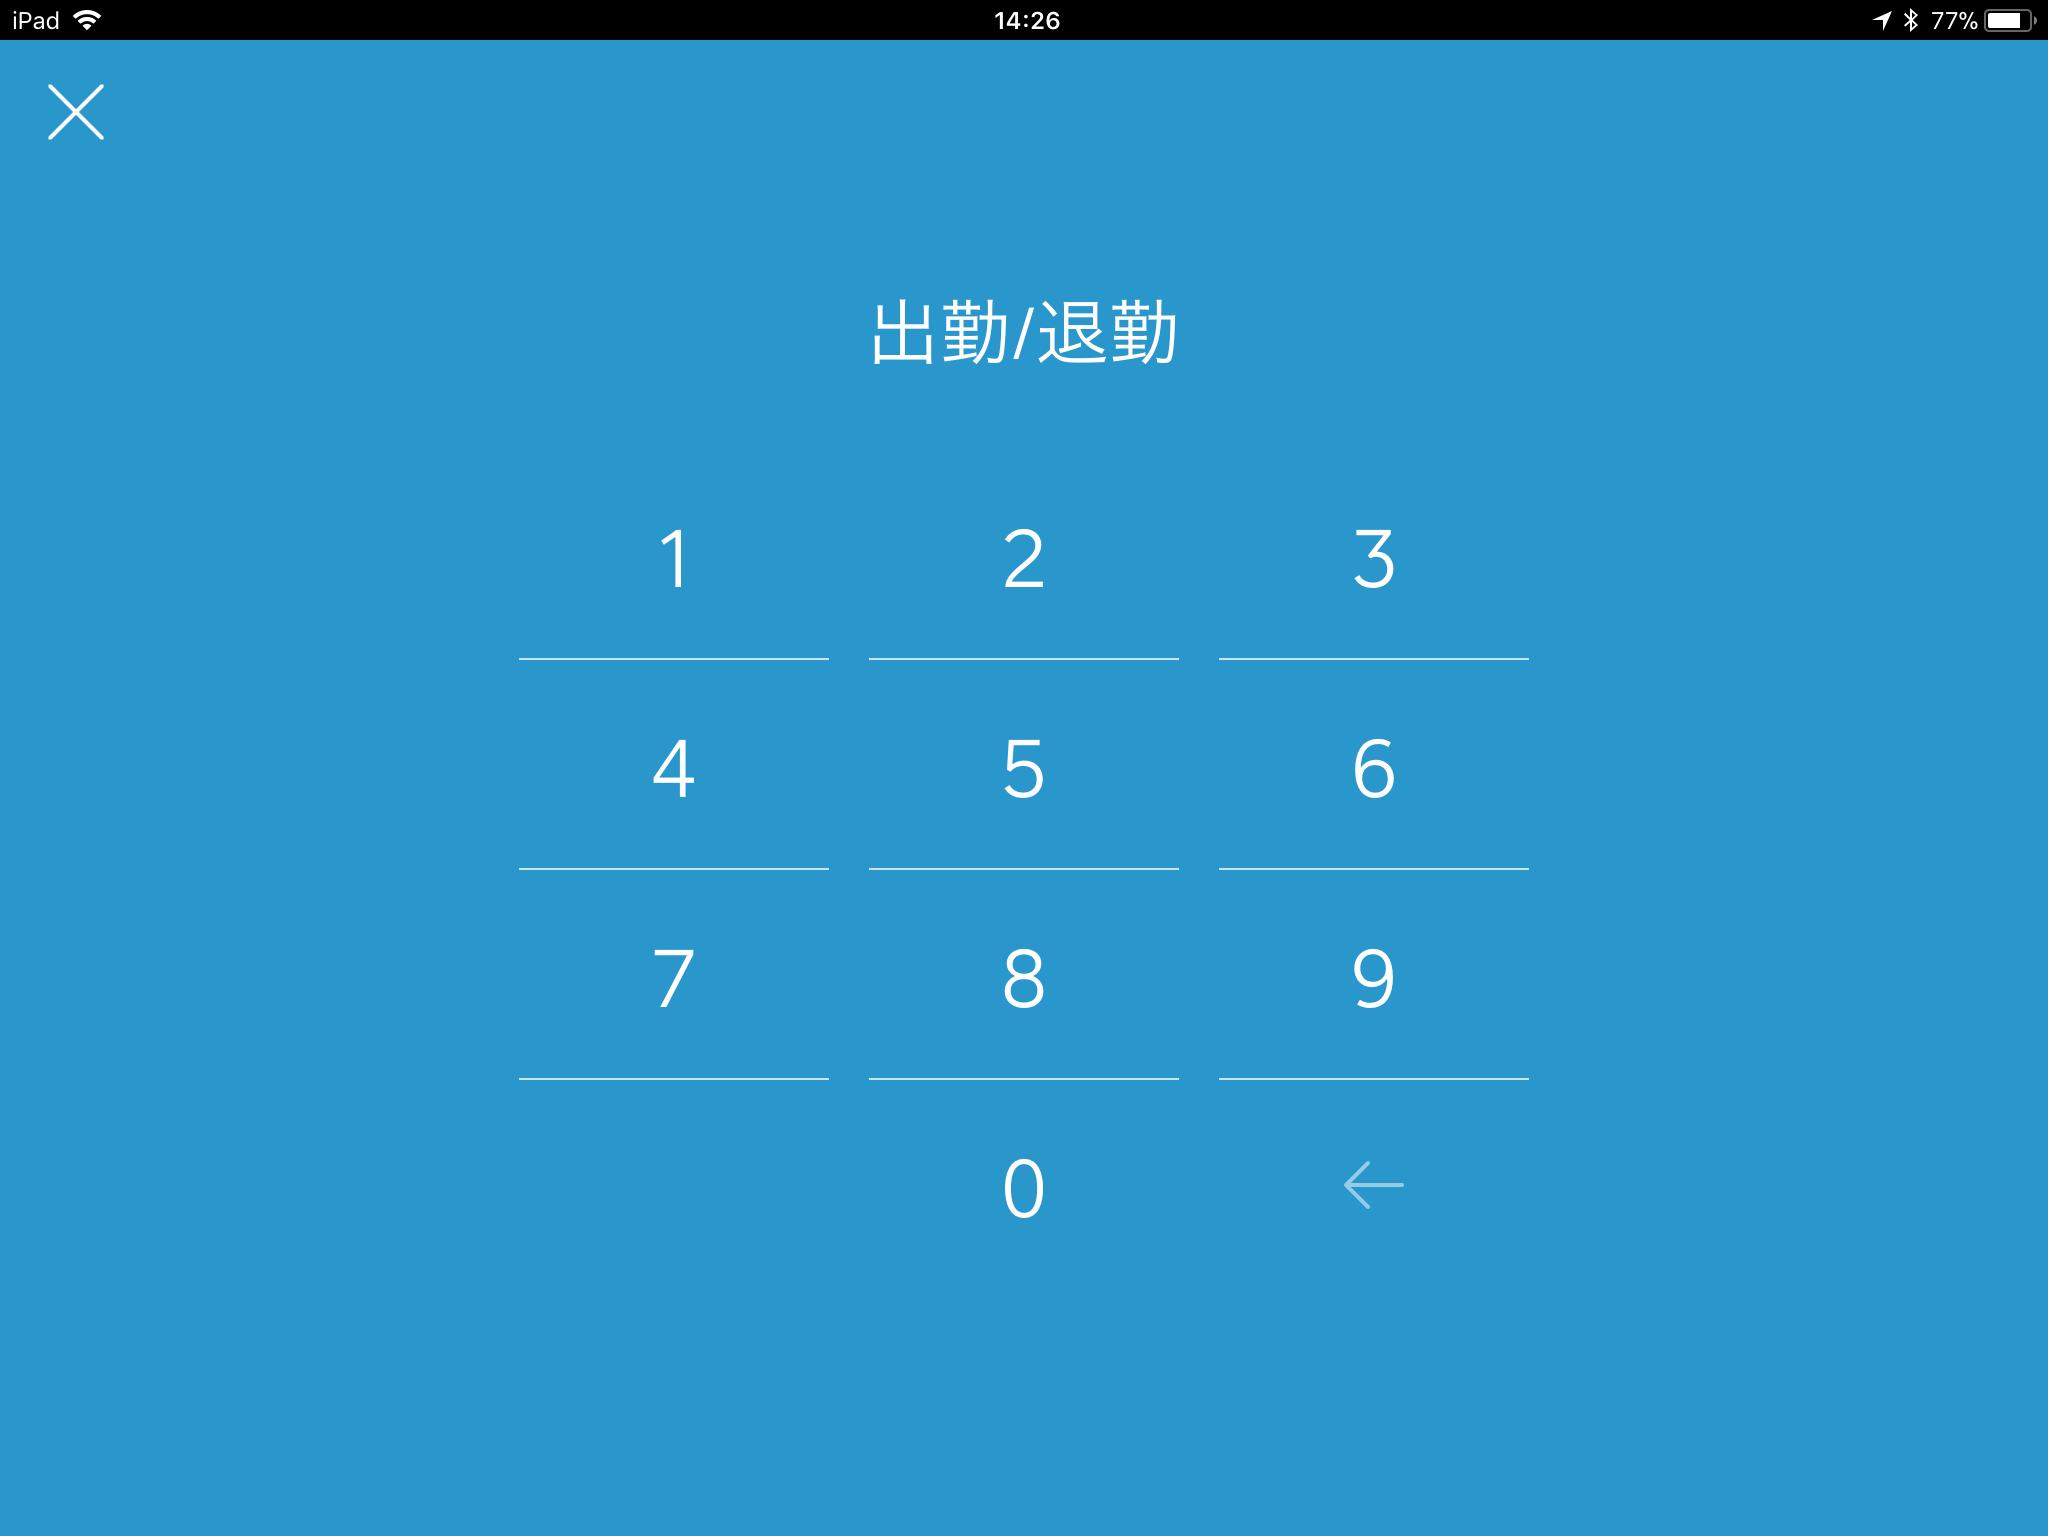 JP Clock In/Out_Blue Screen_iPad